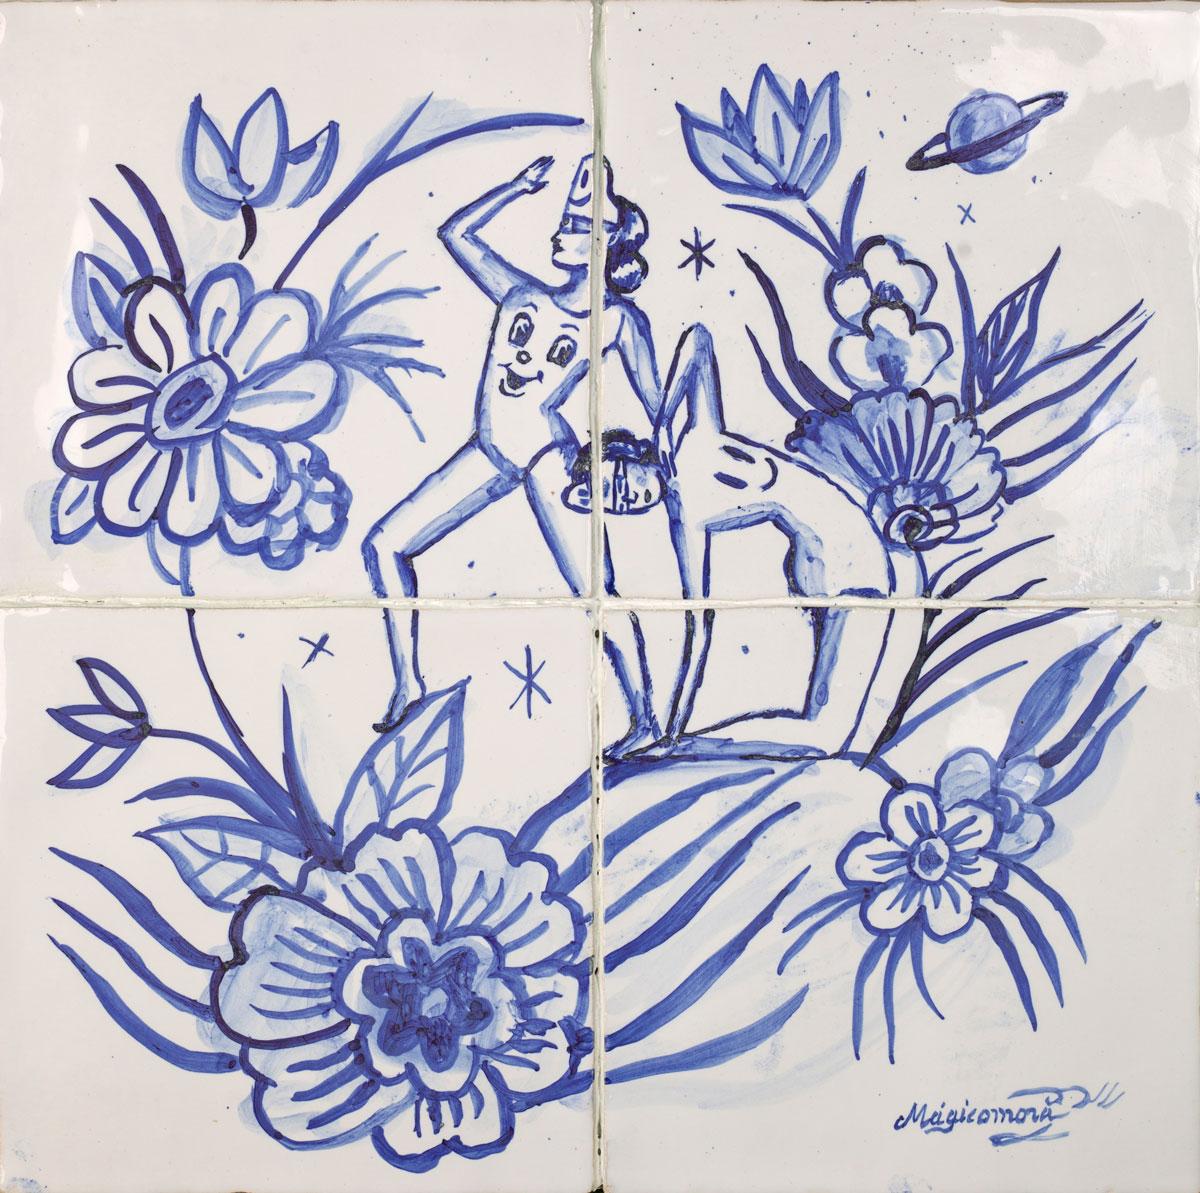 Sergio Mora, Cosmic Girls, 2020, smalto su azulejos, 30x30 cm